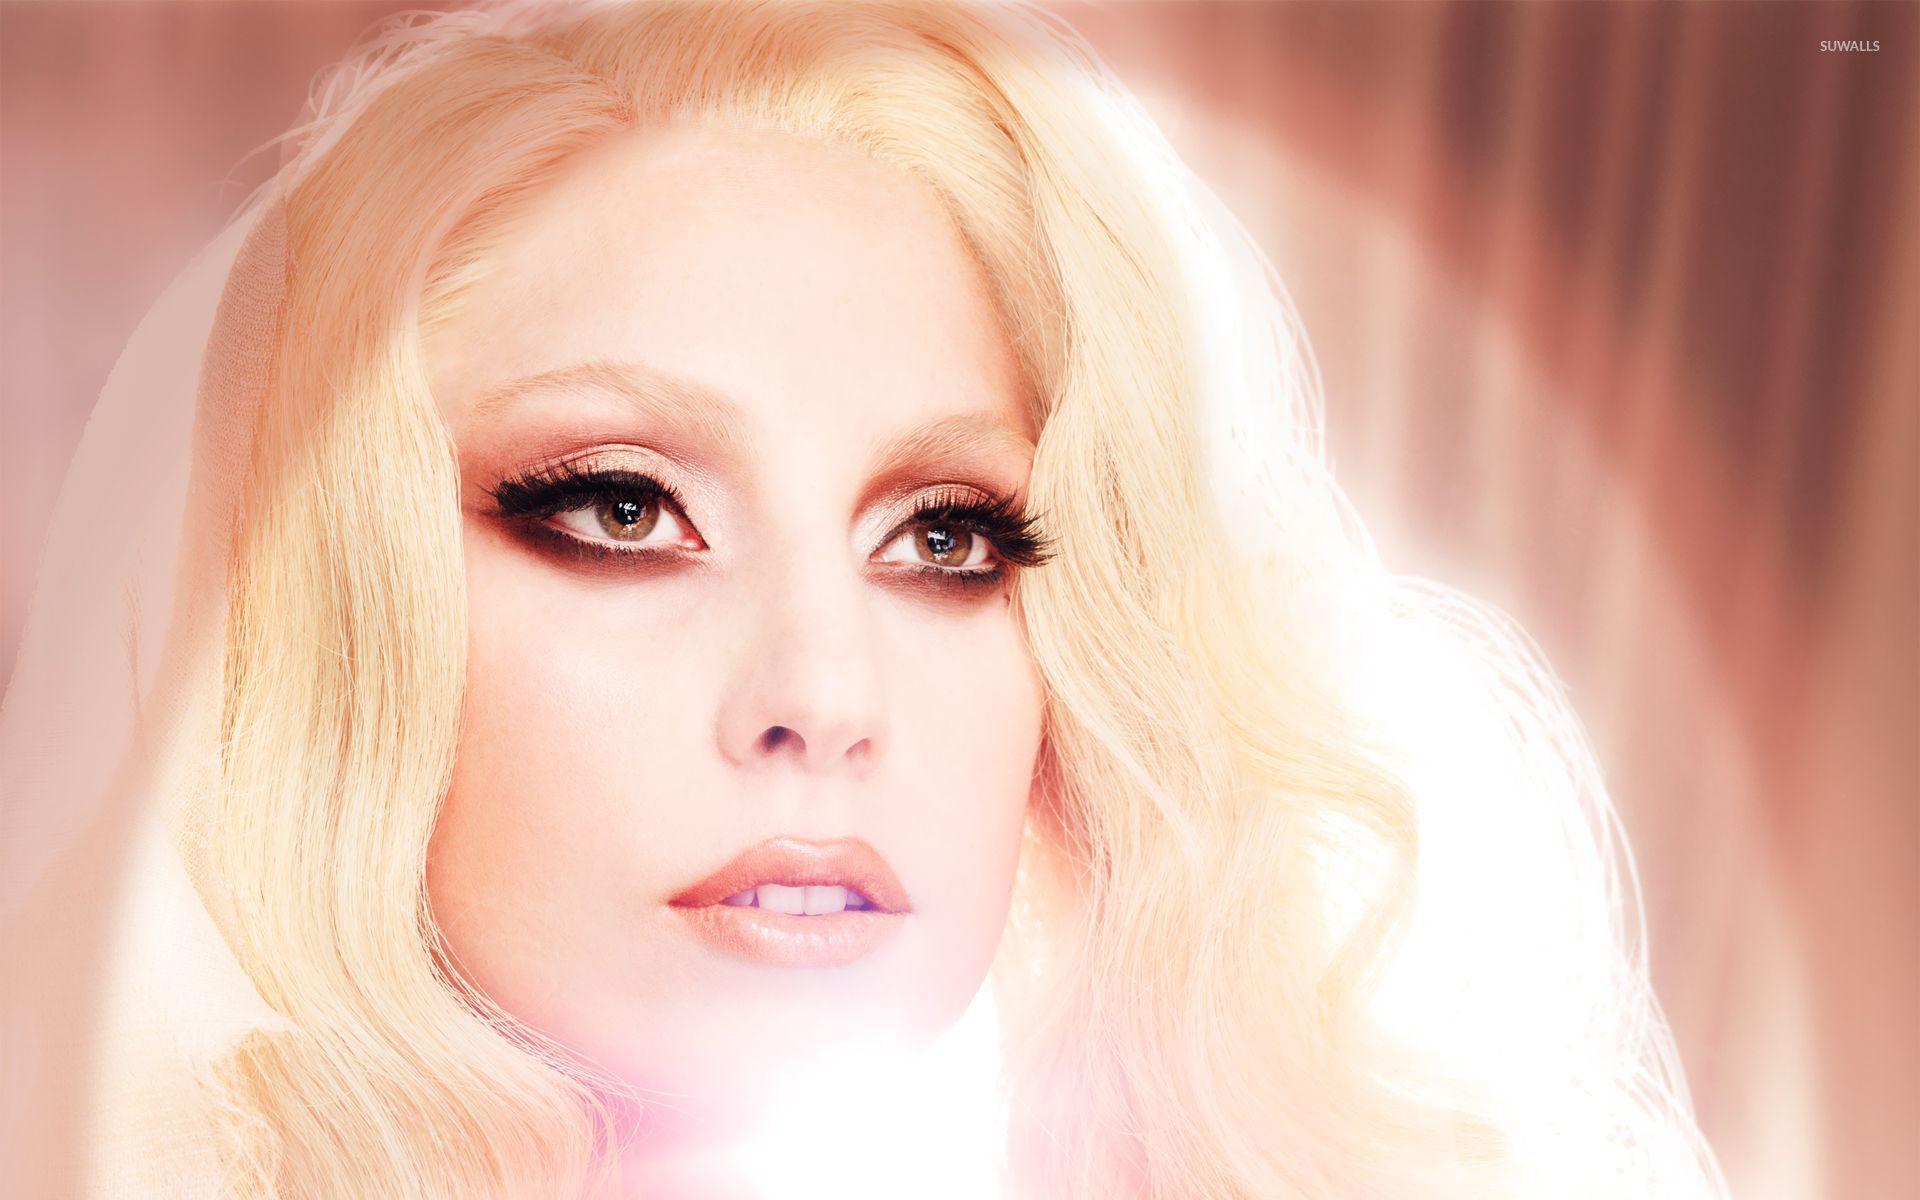 Lady Gaga High Quality Wallpapers